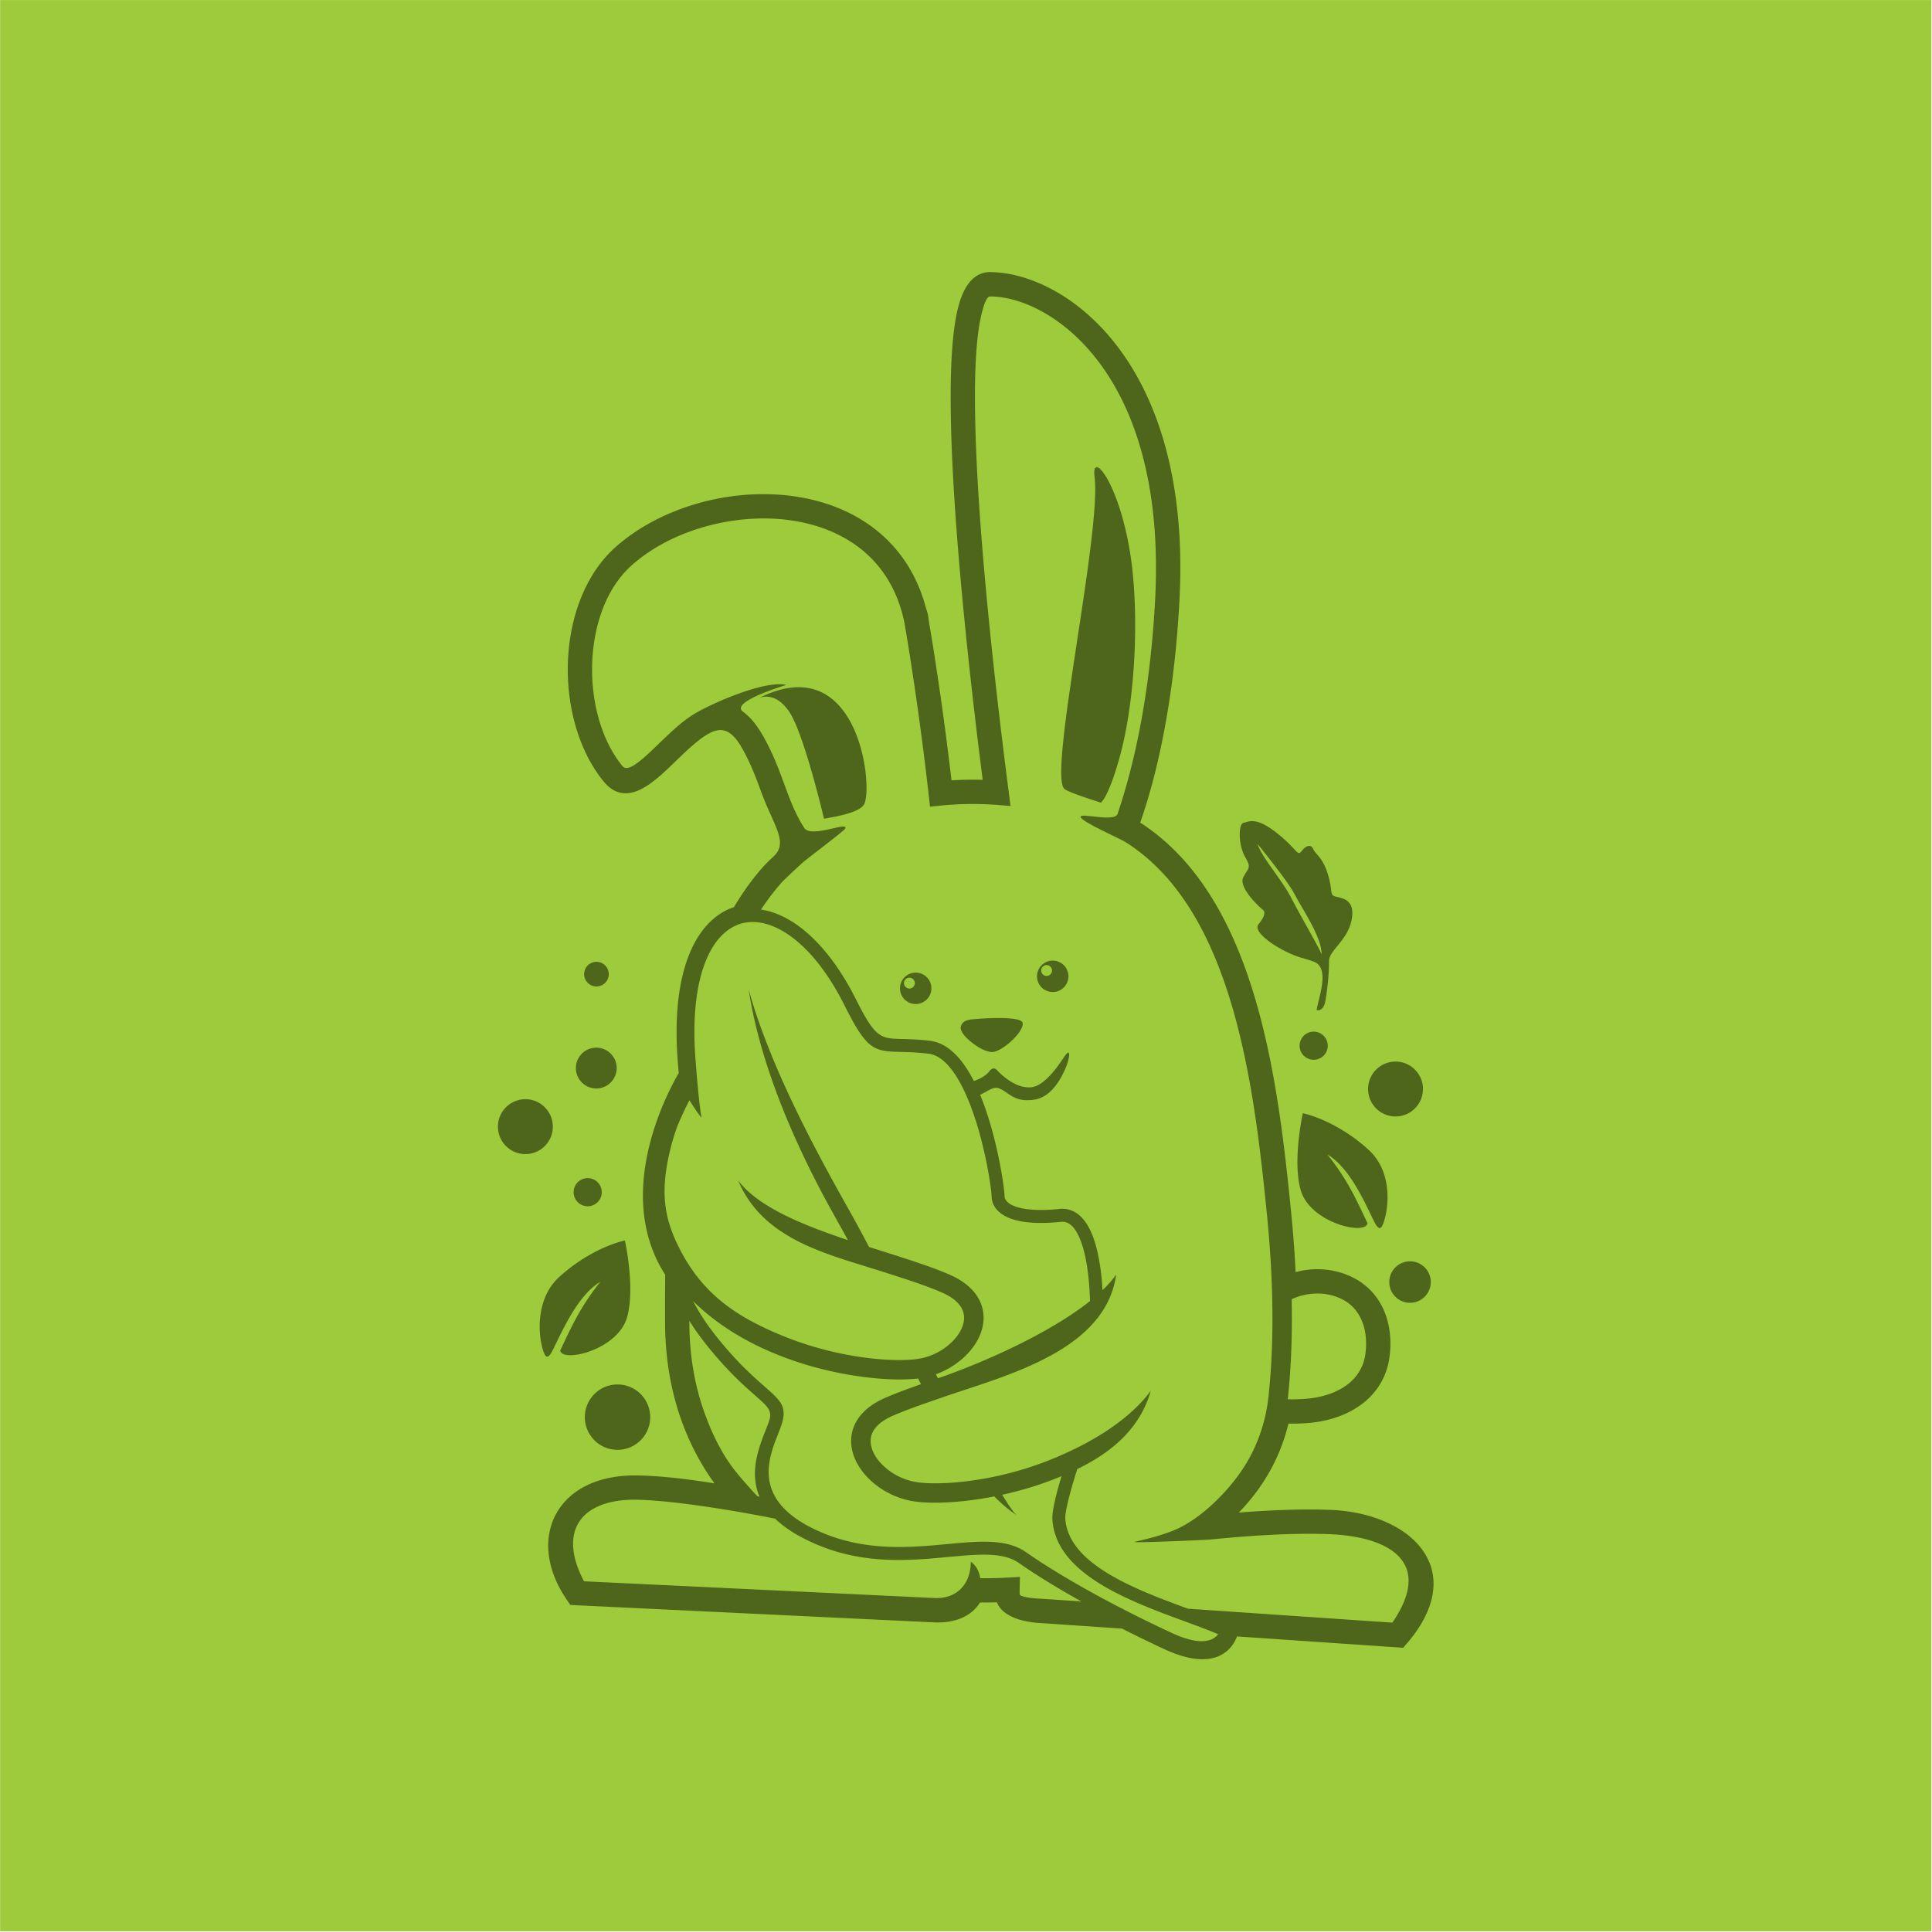 Design a healthy n delicious logo for Get Hug restaurant!!!